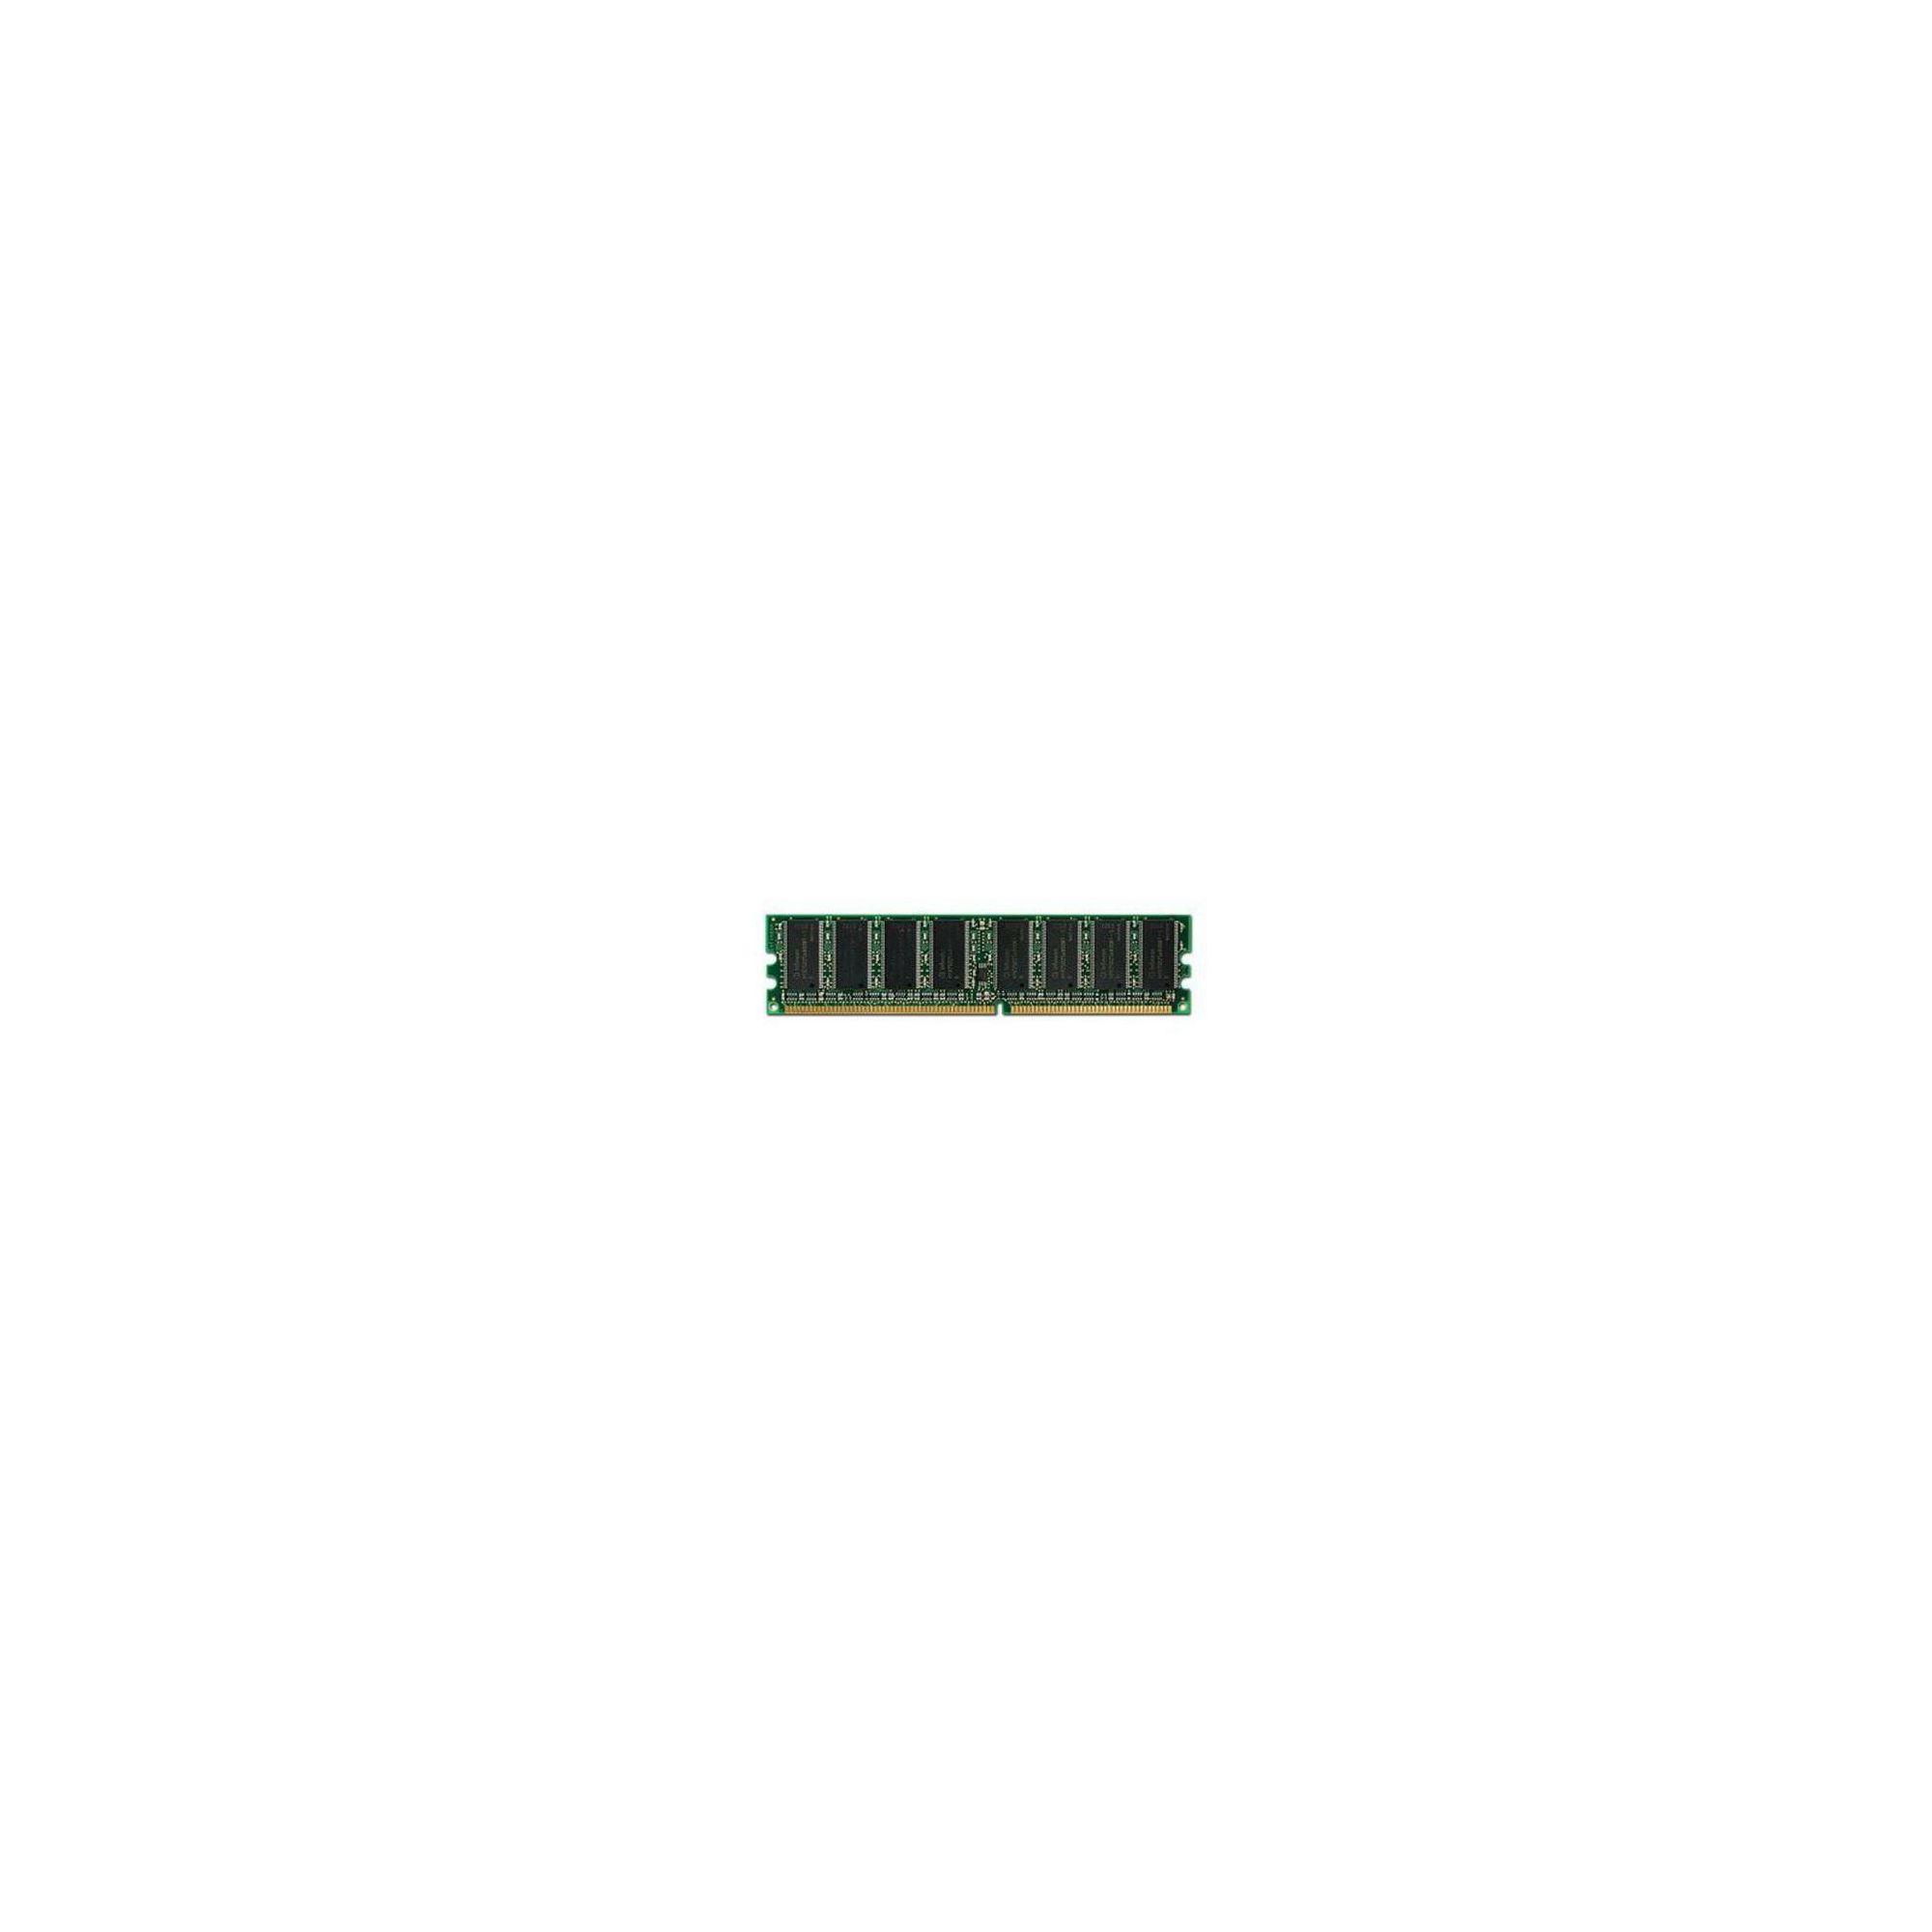 Hewlett-Packard CB423A 256 MB DDR2 144-pin DIMM at Tesco Direct